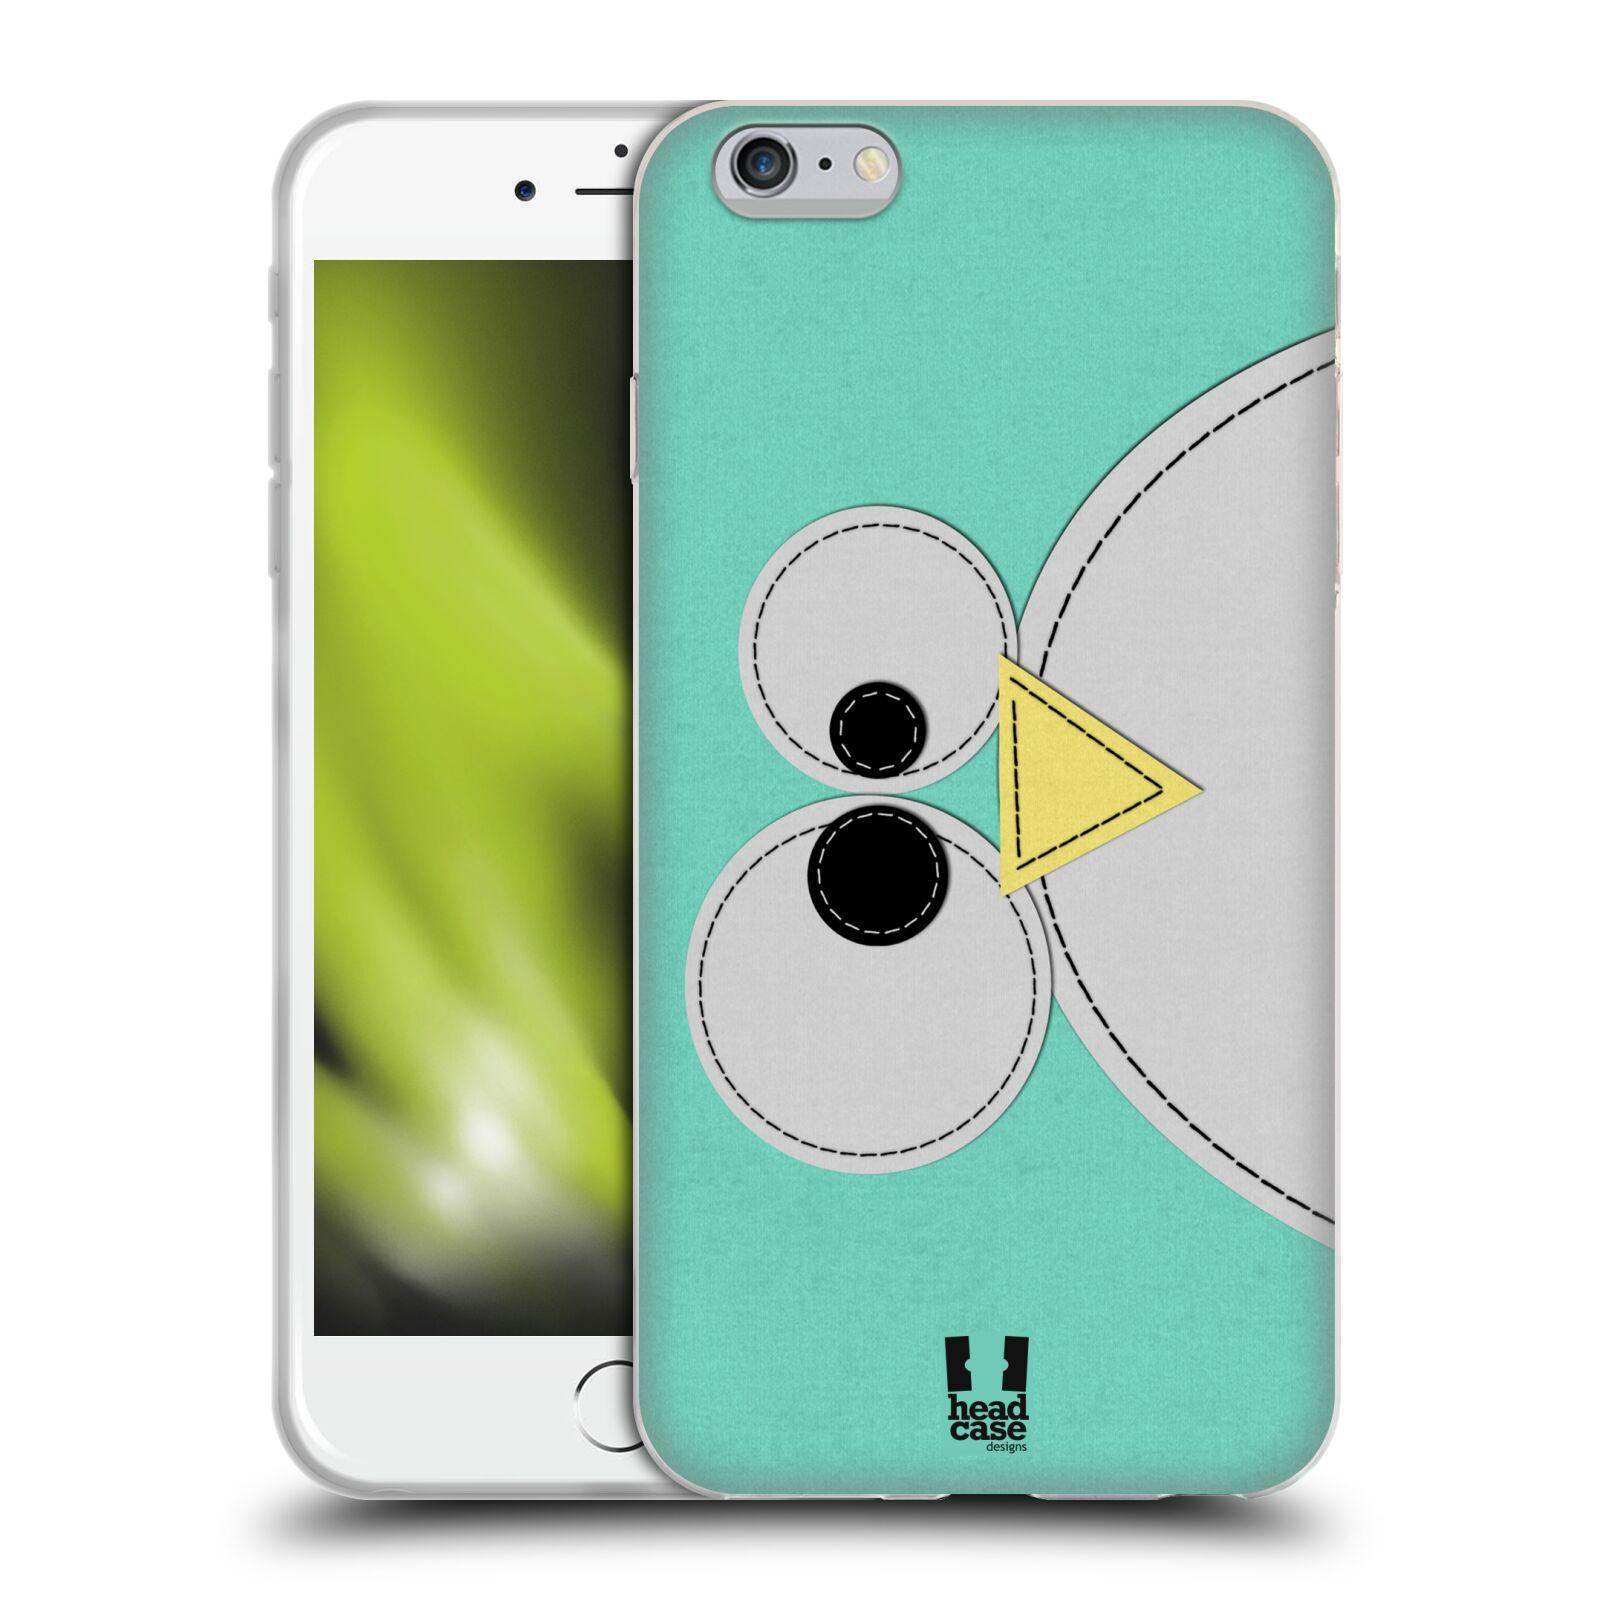 HEAD CASE silikonový obal na mobil Apple Iphone 6 PLUS/ 6S PLUS vzor zvířecí nášivka modrý tučňák